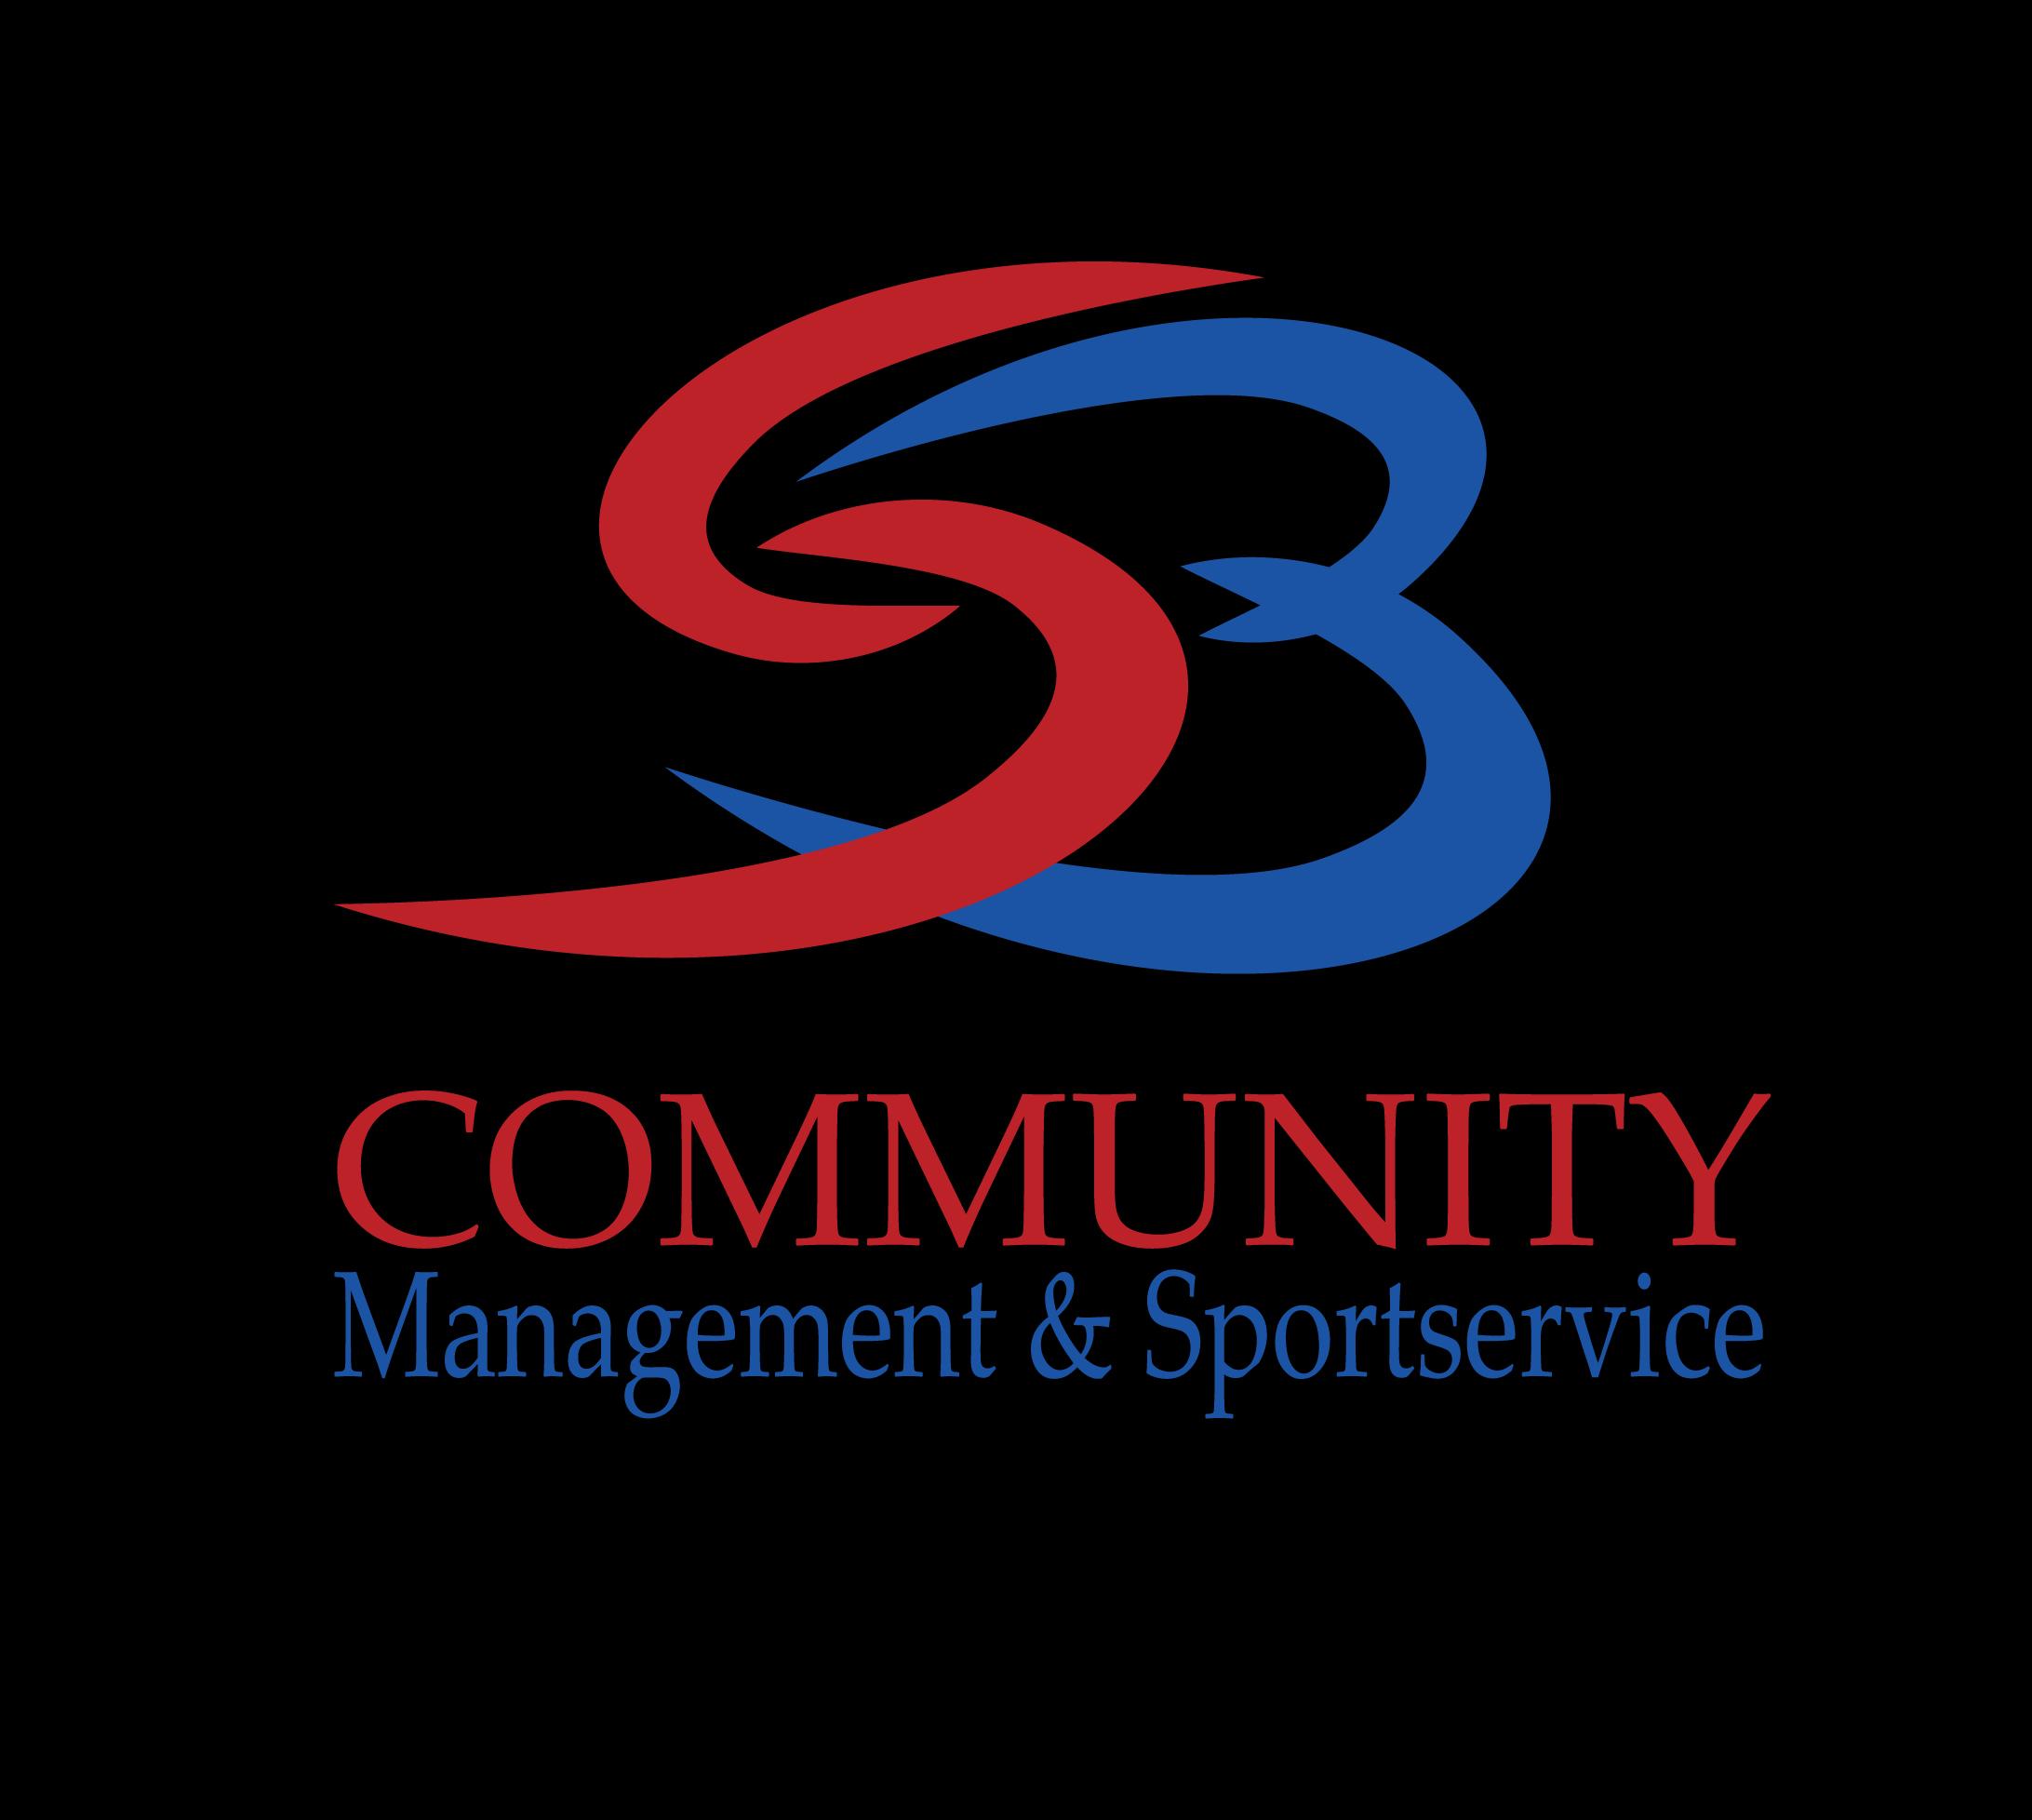 SB Community